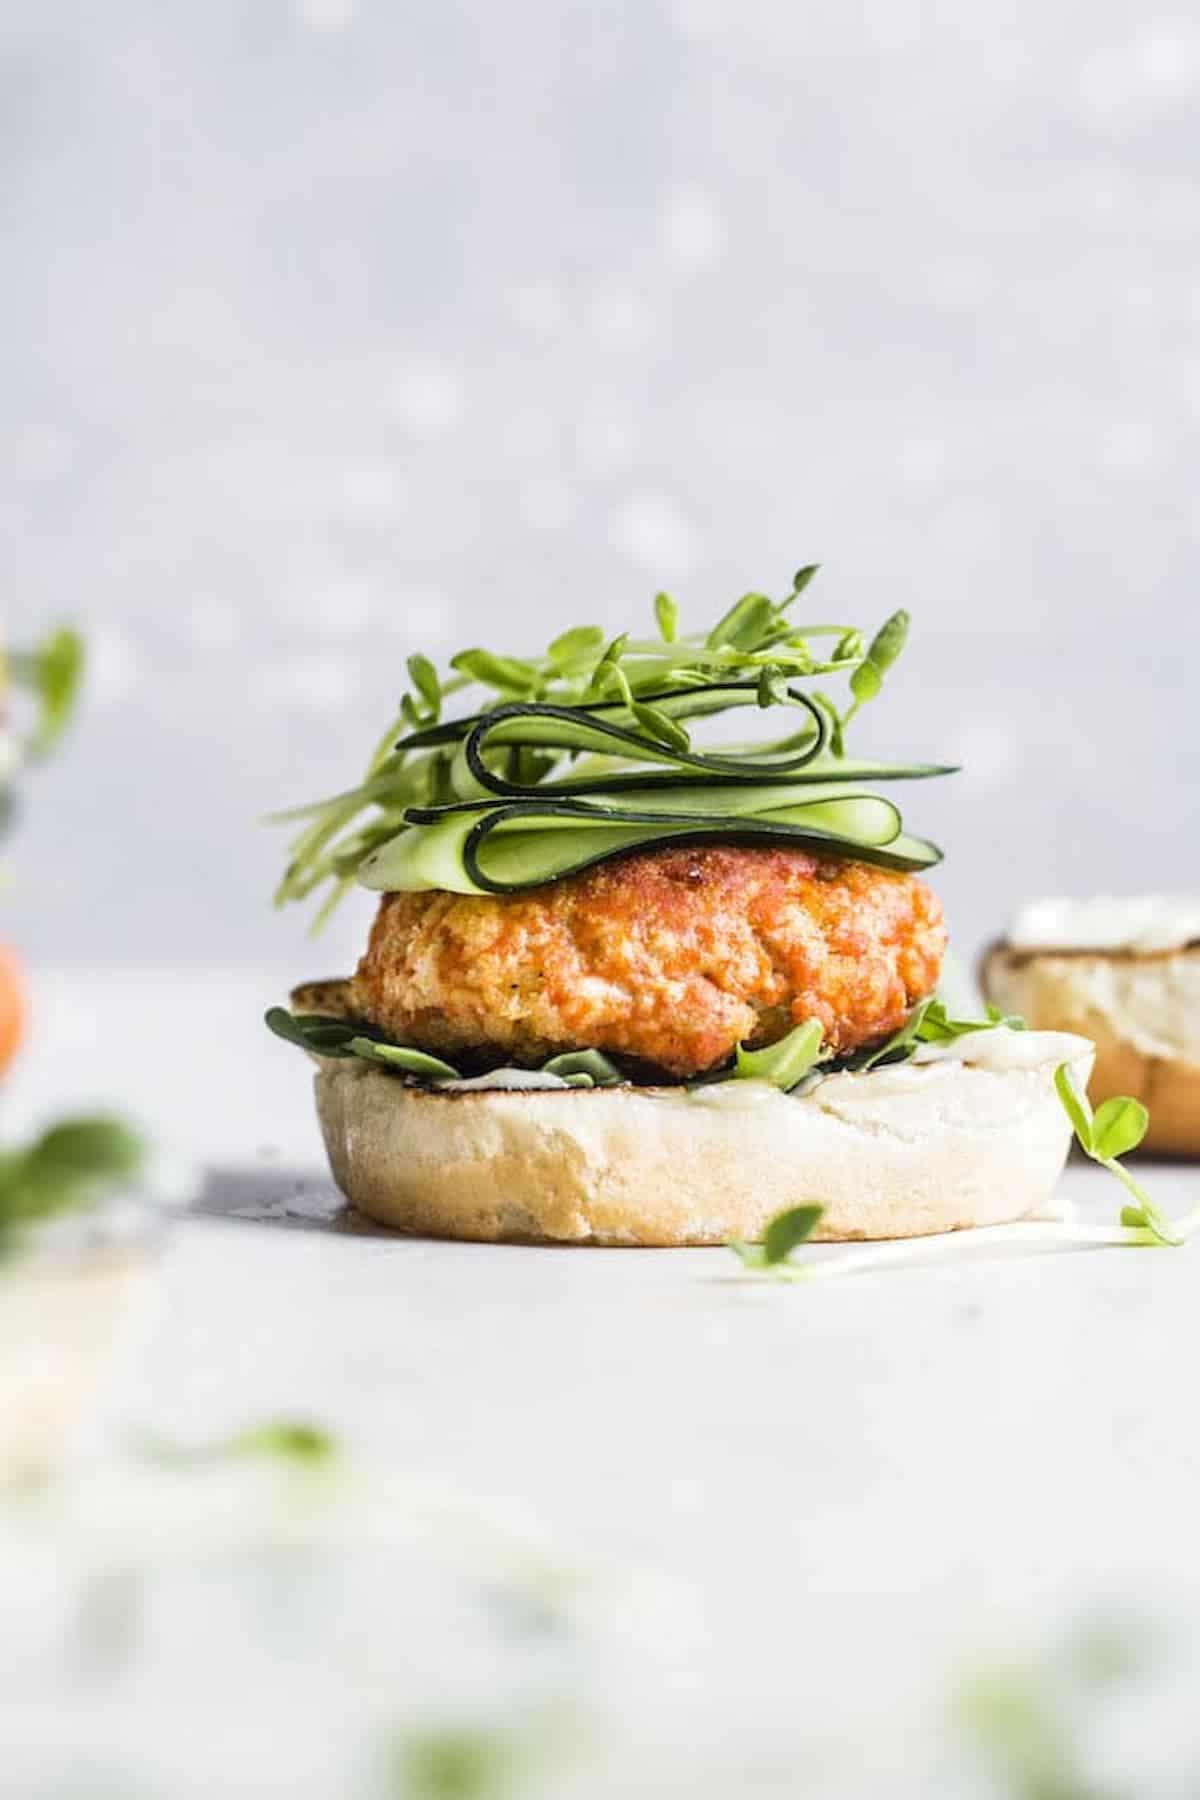 salmon burger on a bun